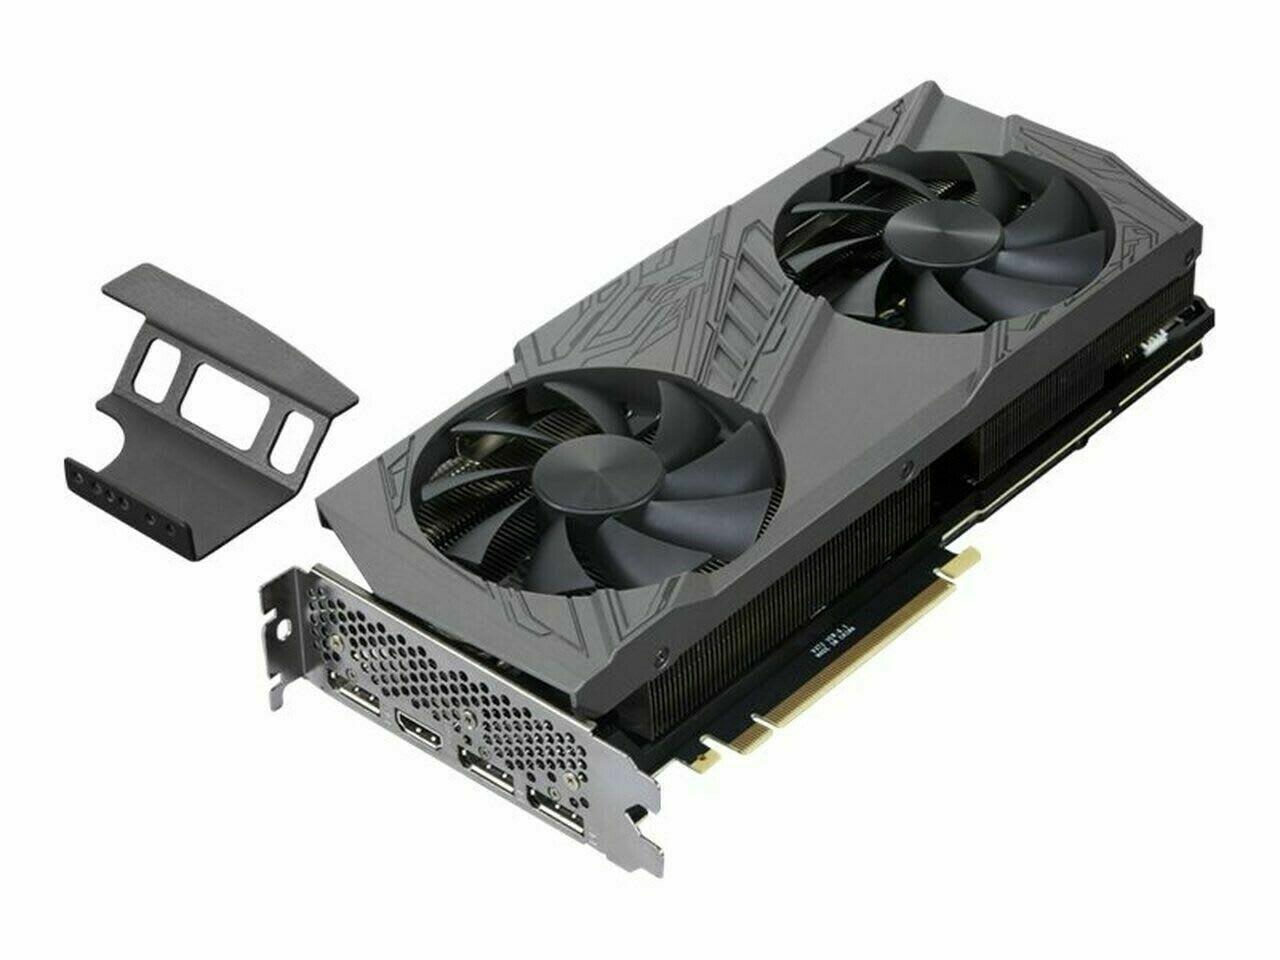 NVIDIA GeForce RTX 2080 Super 8GB Graphics Card